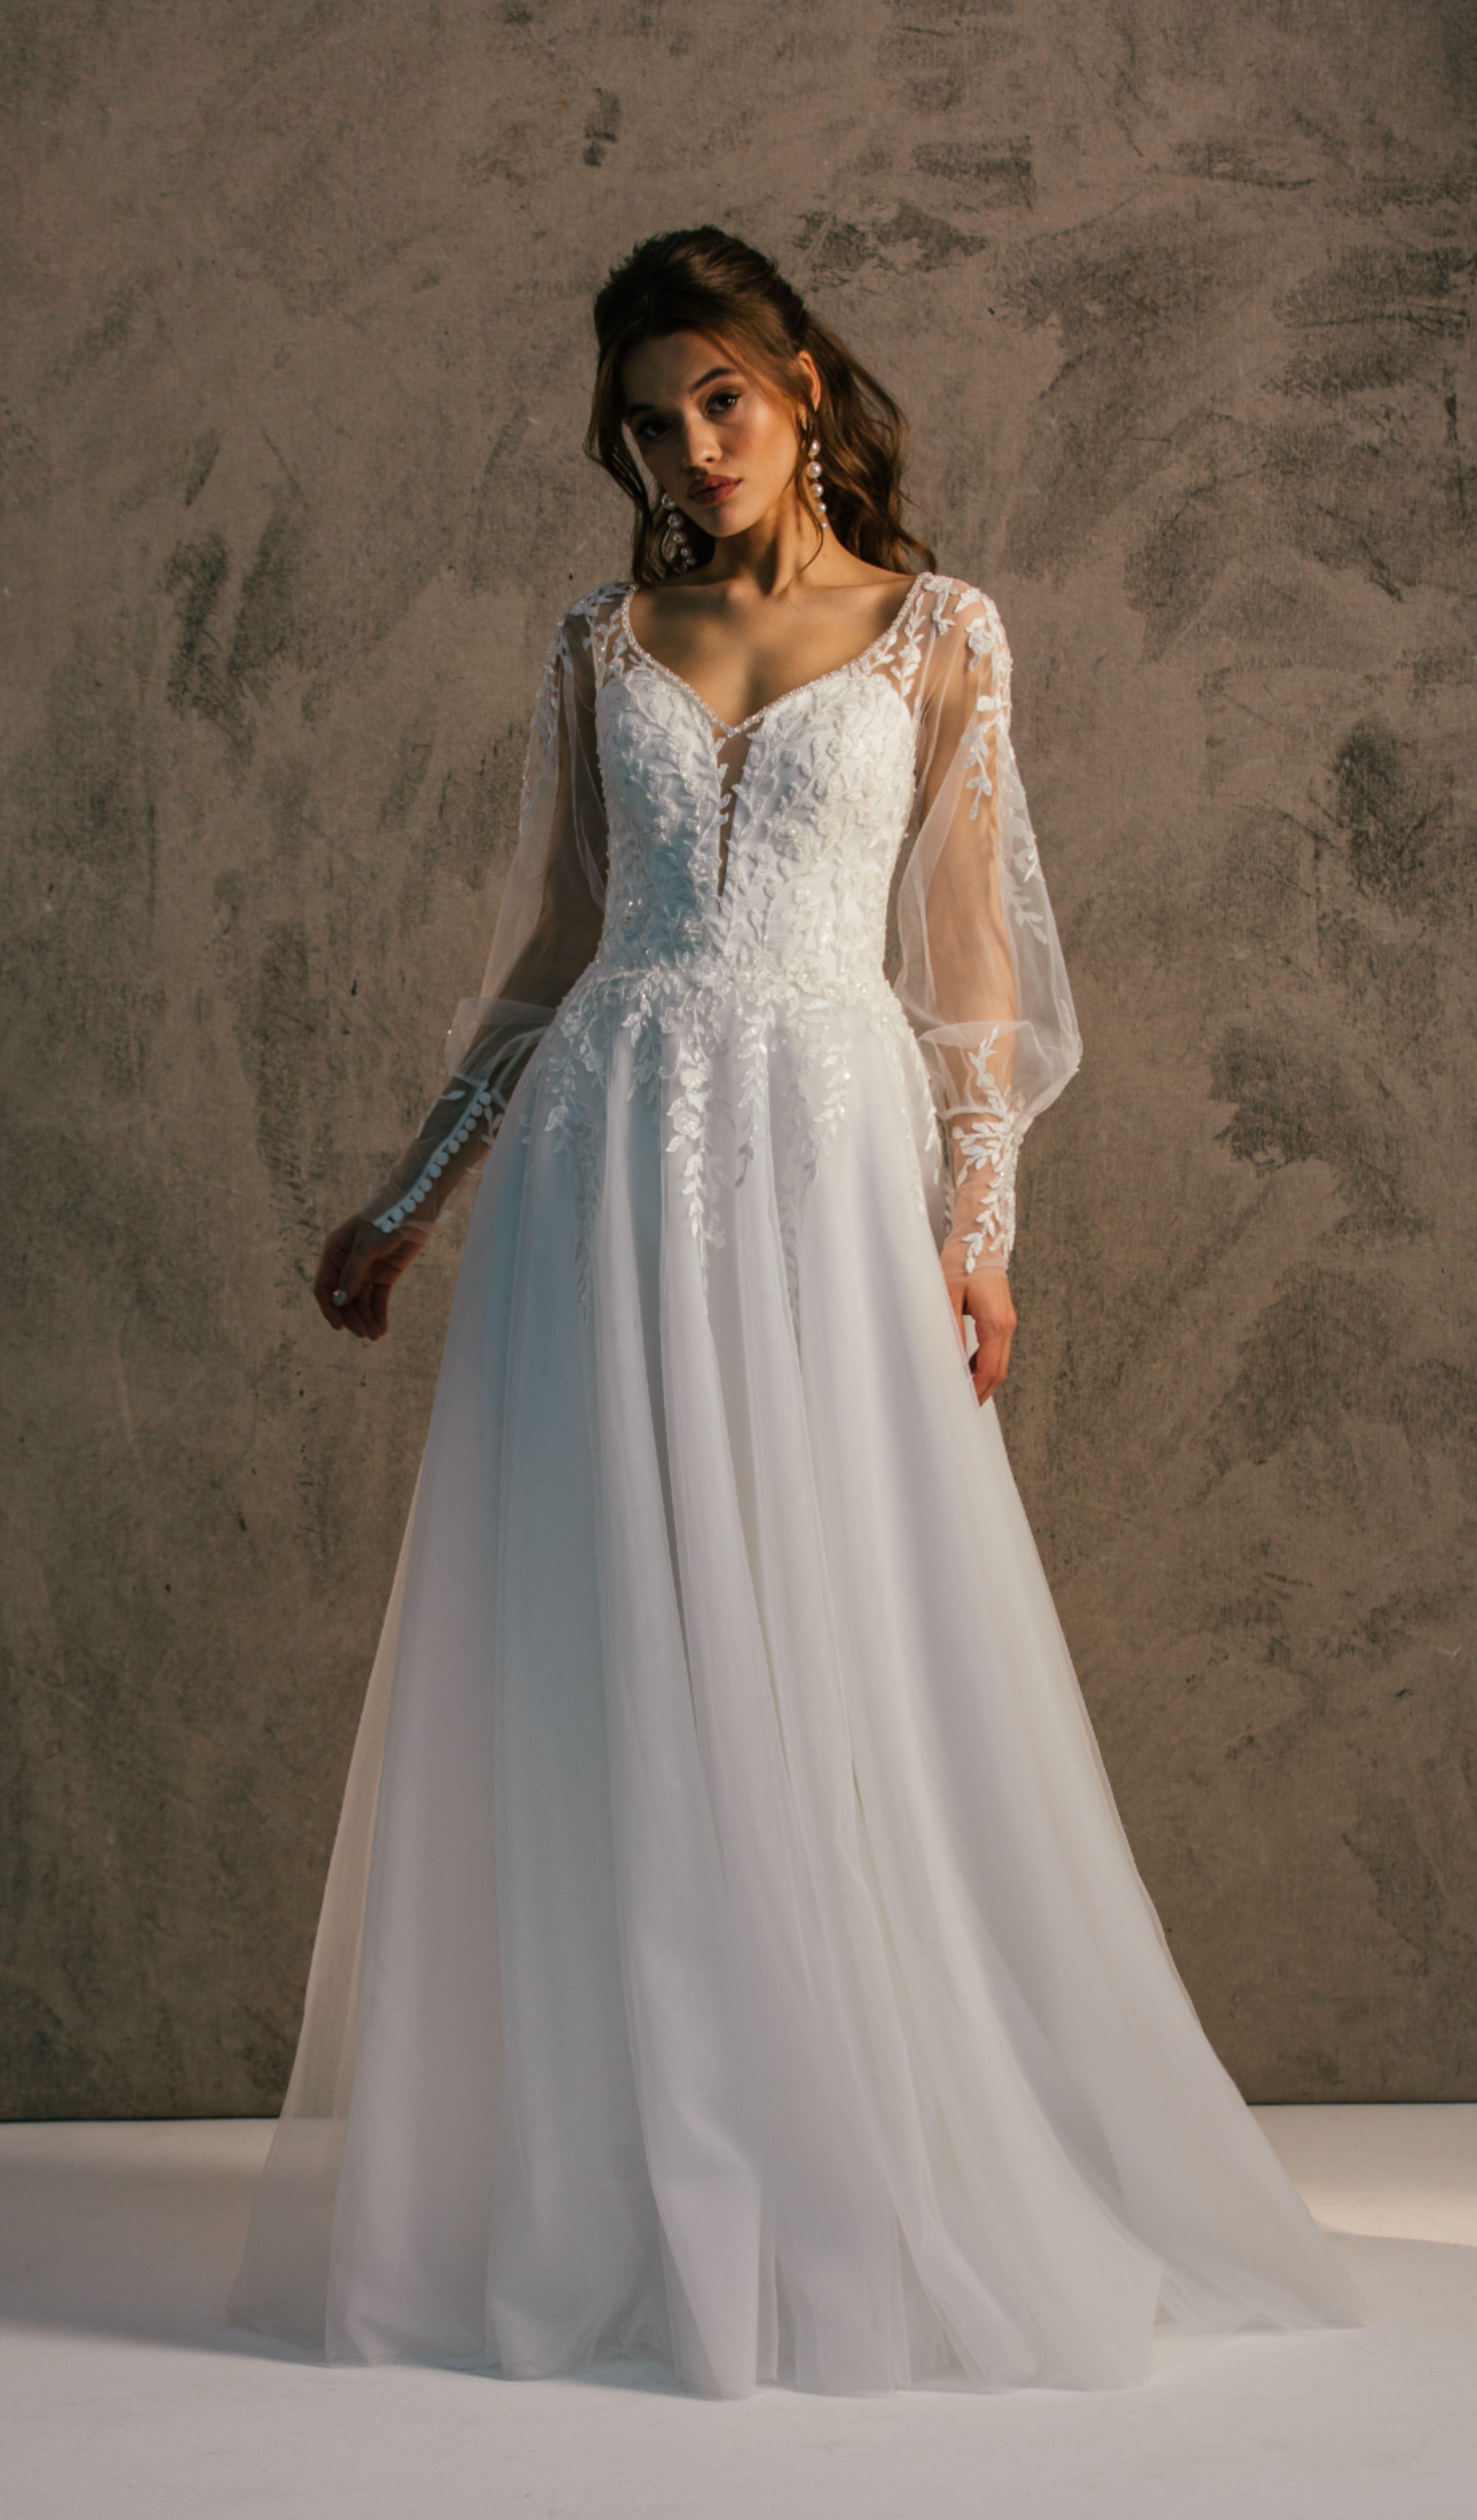 Liss Wedding Dress Magic Balance Collection Wedding Dresses Simple Elegant Wedding Dress Buy Wedding Dress [ 6552 x 3839 Pixel ]